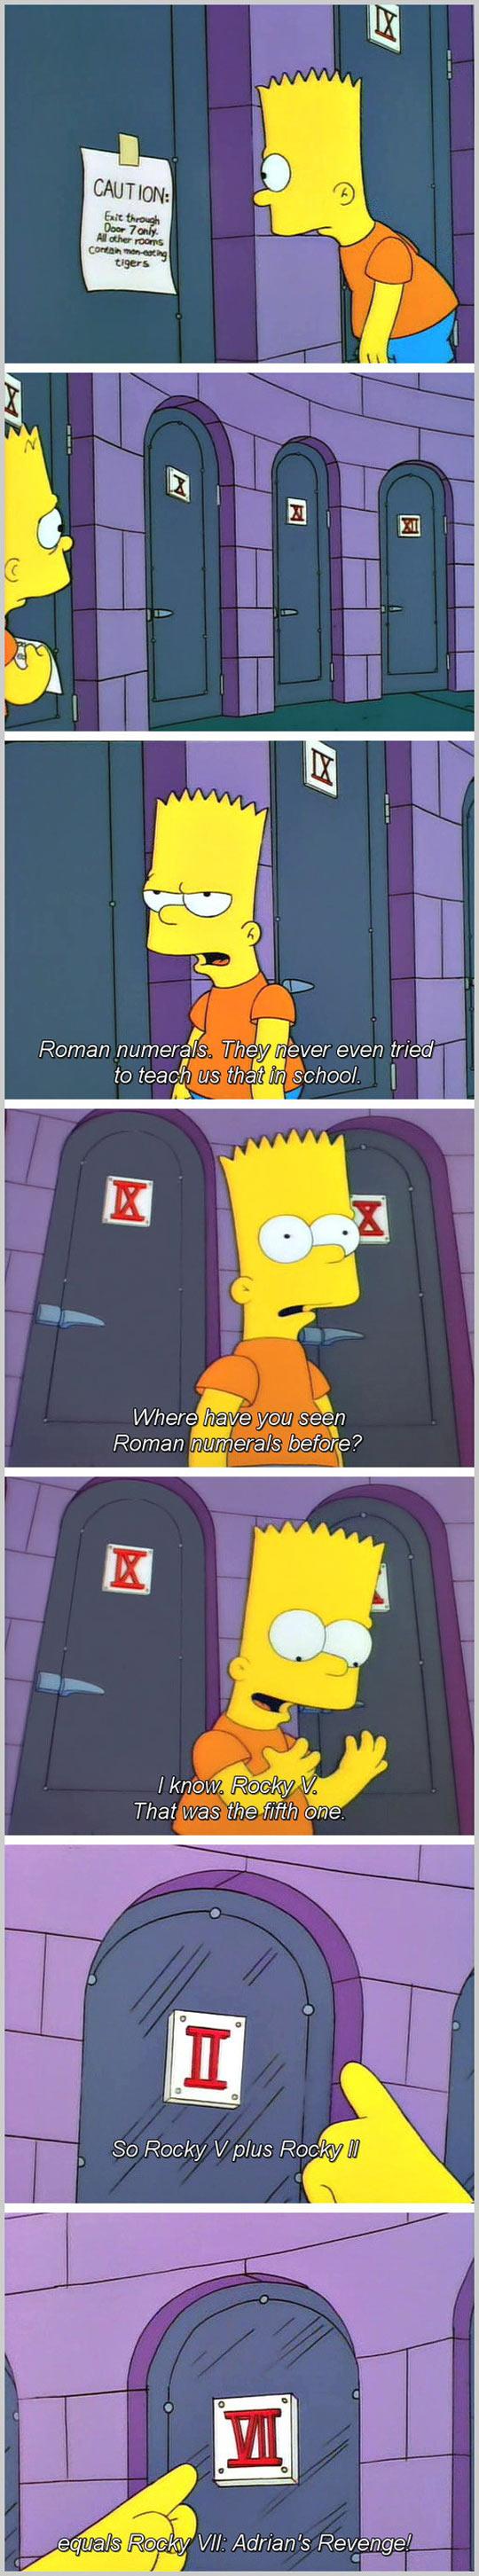 The Simpsons Roman numerals...